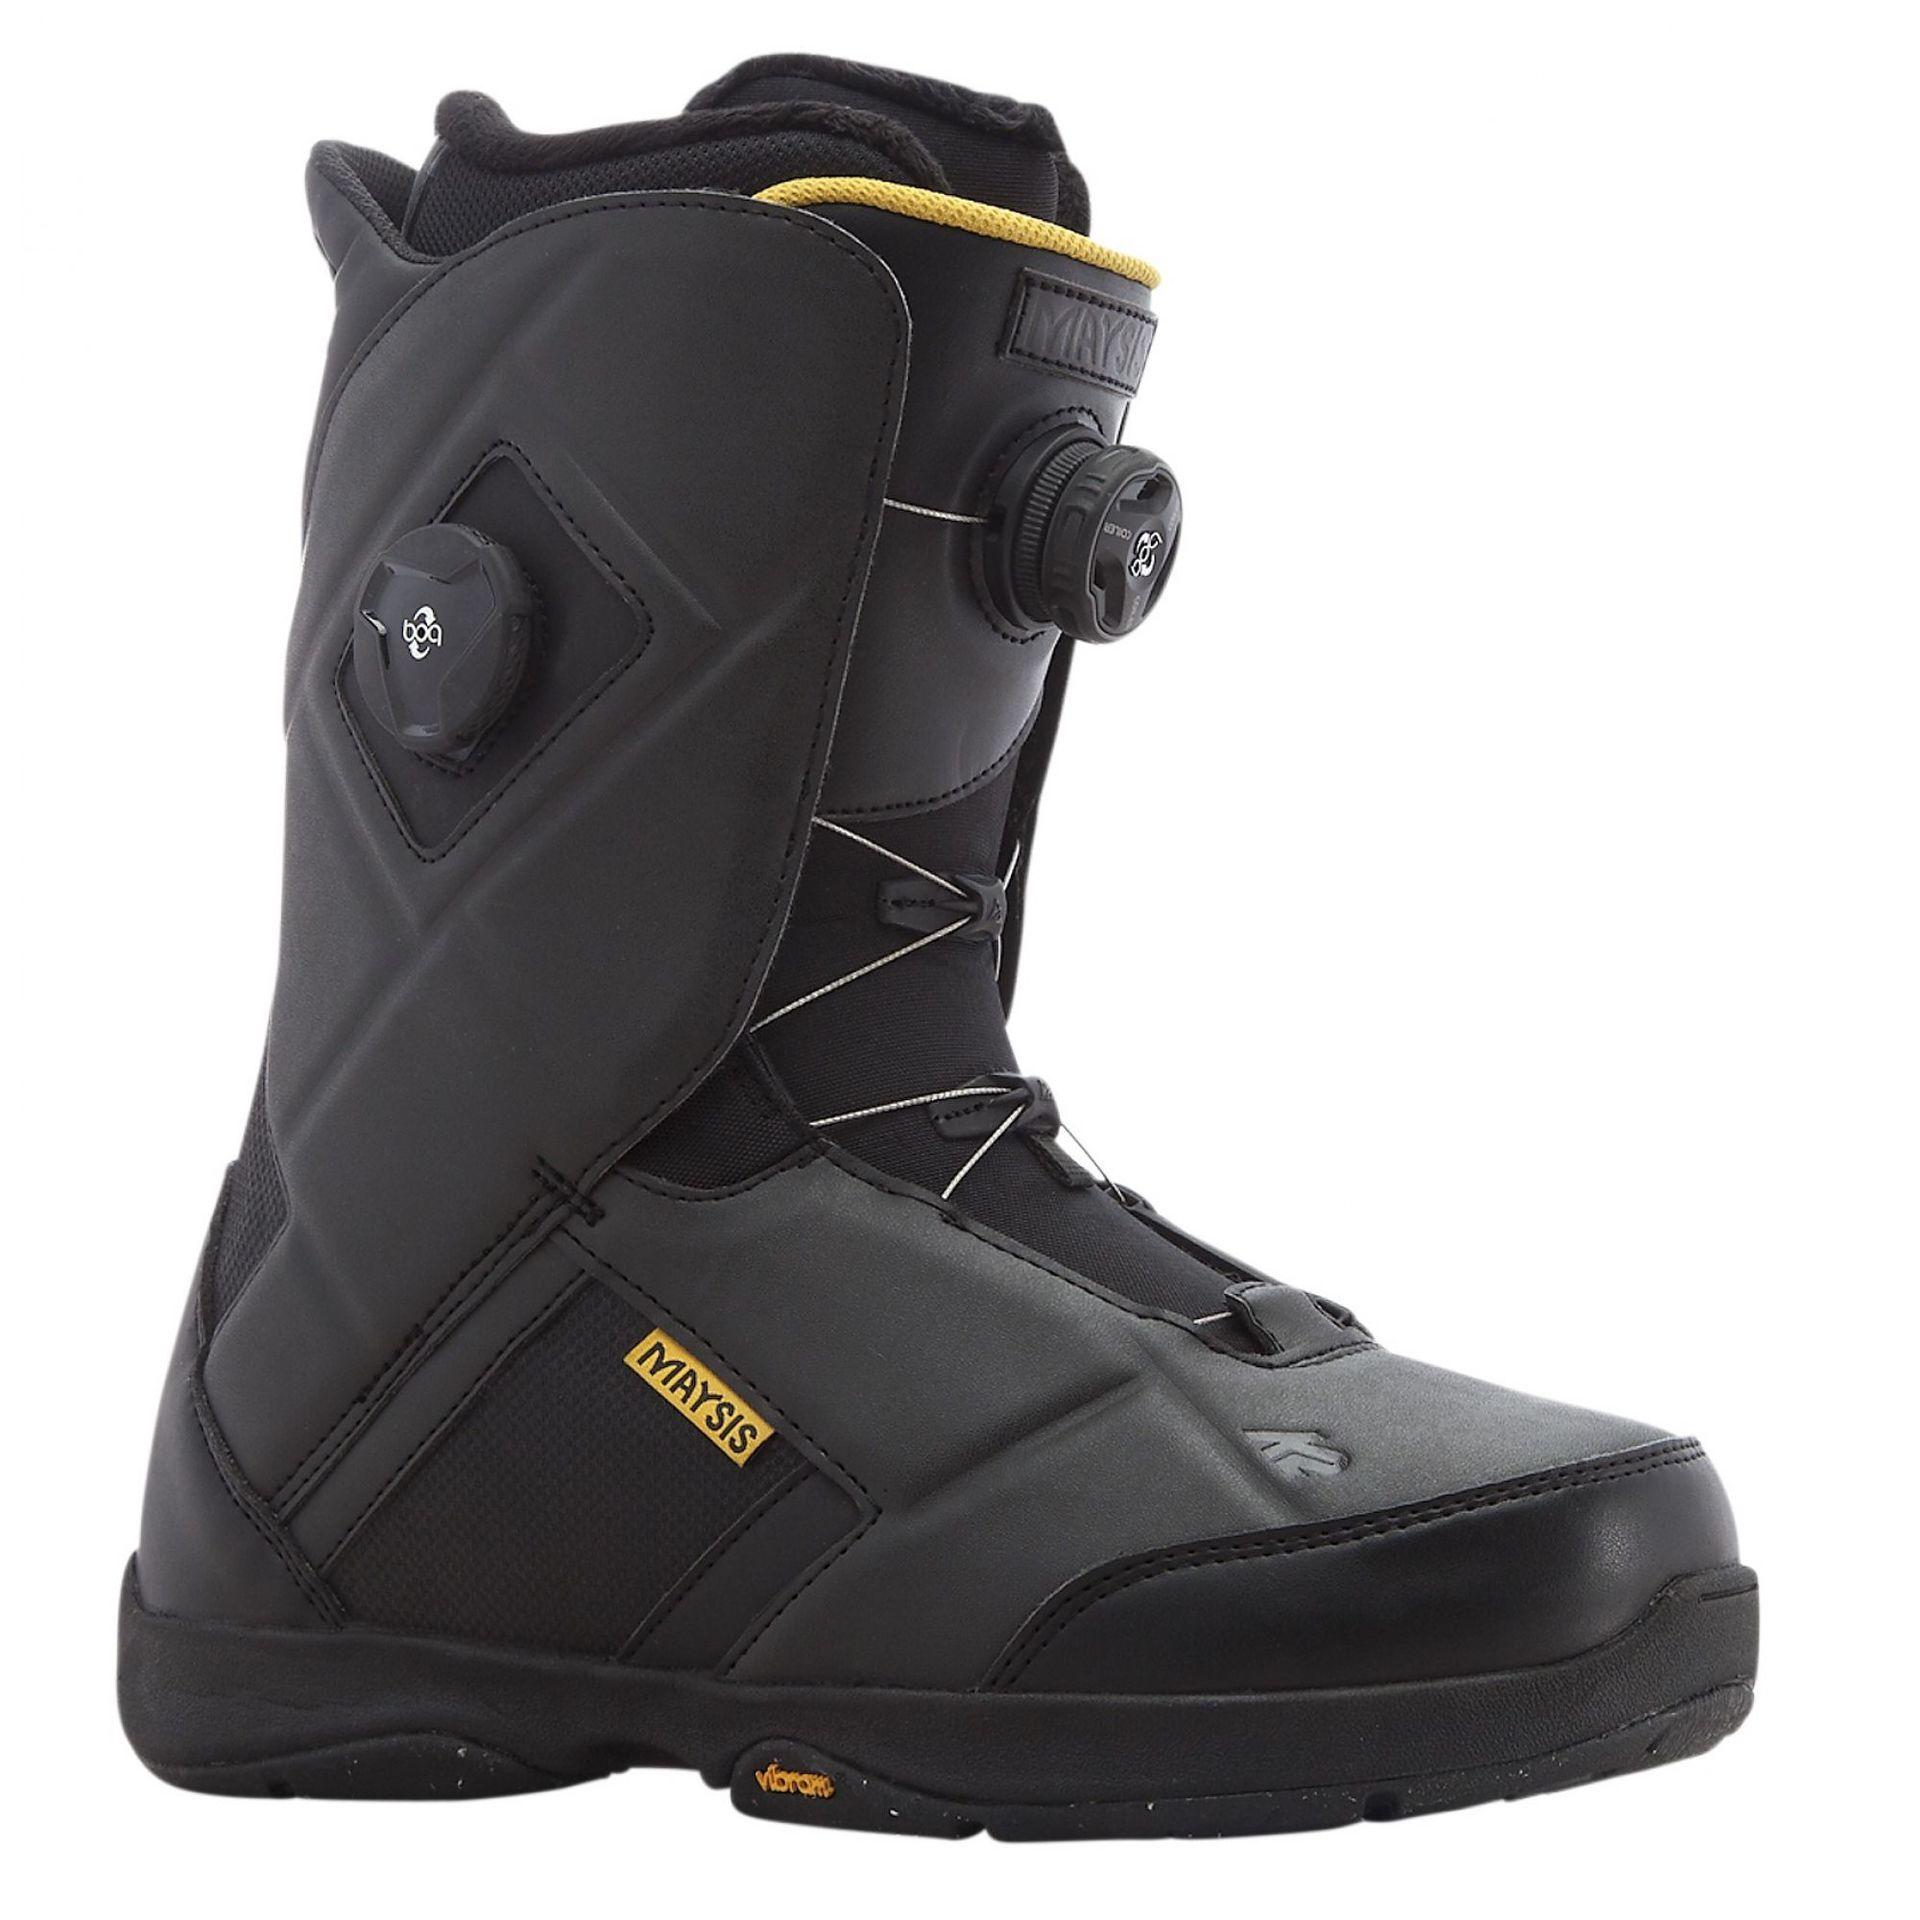 BUTY SNOWBOARDOWE K2 SPORT MAYSIS BLACK